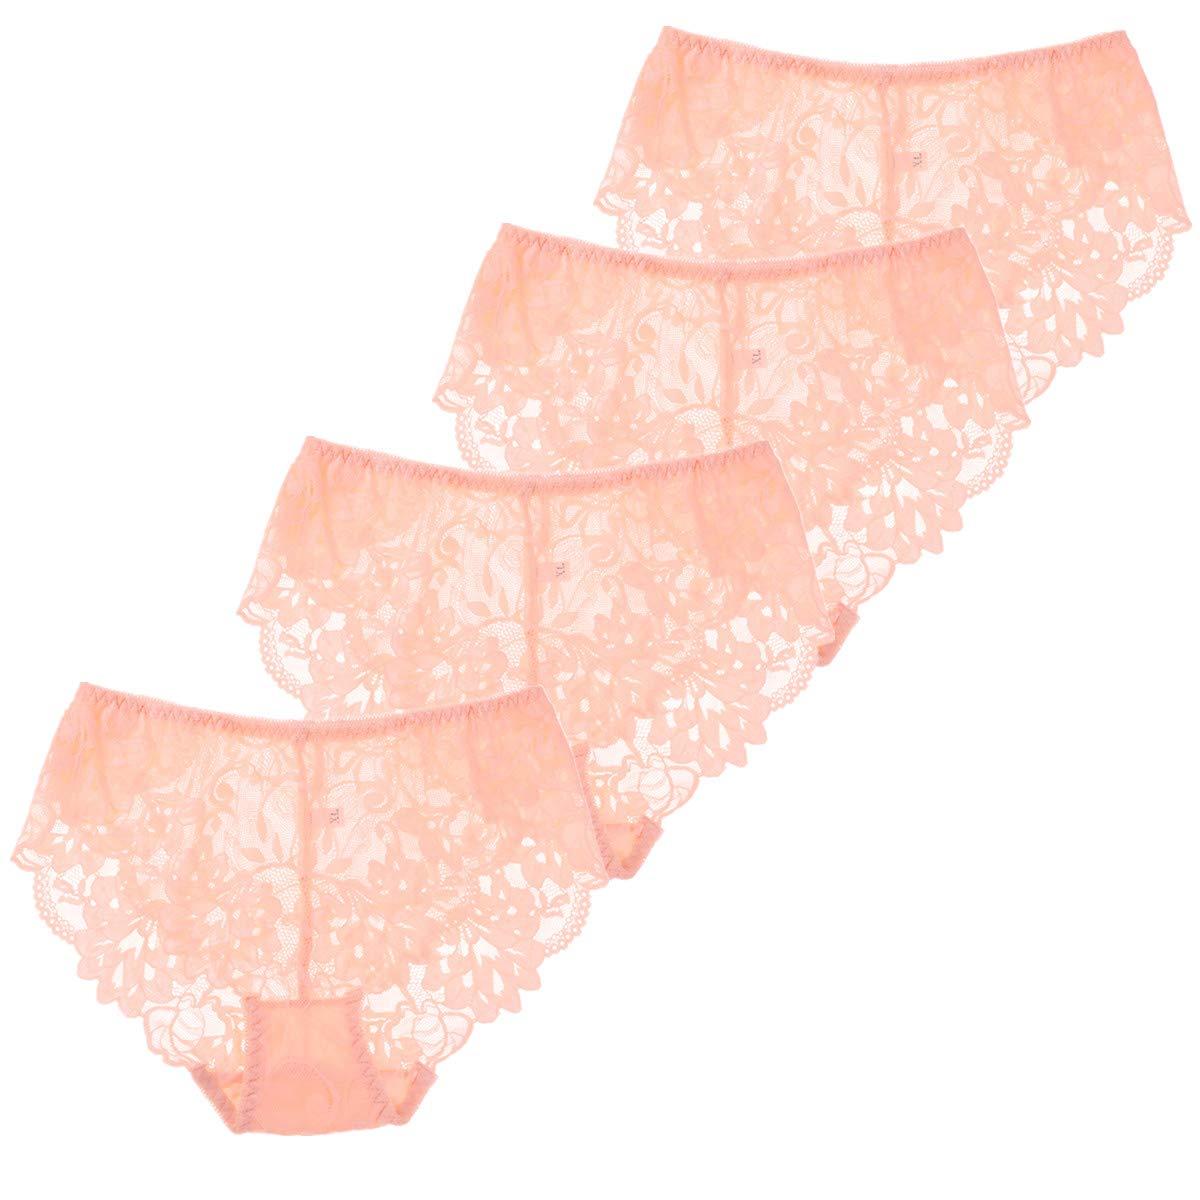 Women 4 Pack Sexy Lace Panties Soft Seamless Plus Size Underwear M-4XL